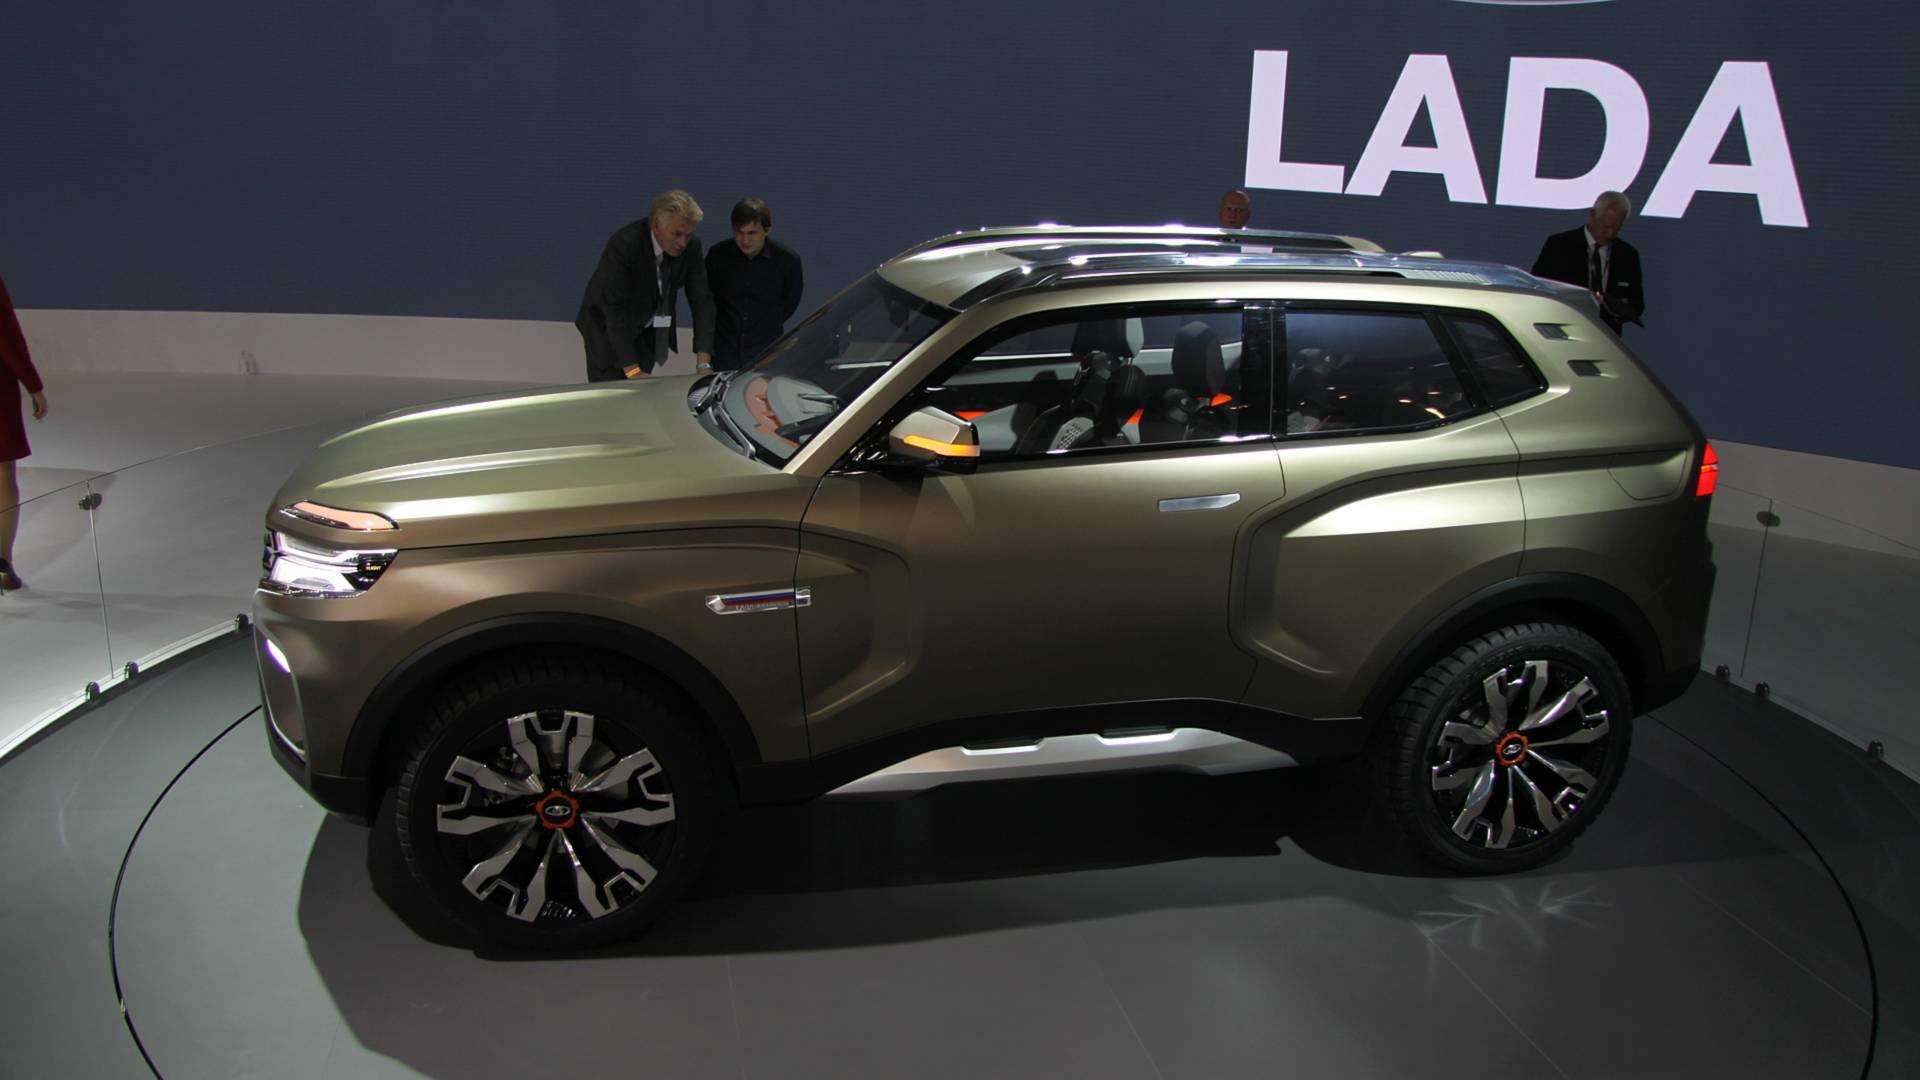 2018-lada-4x4-vision-concept